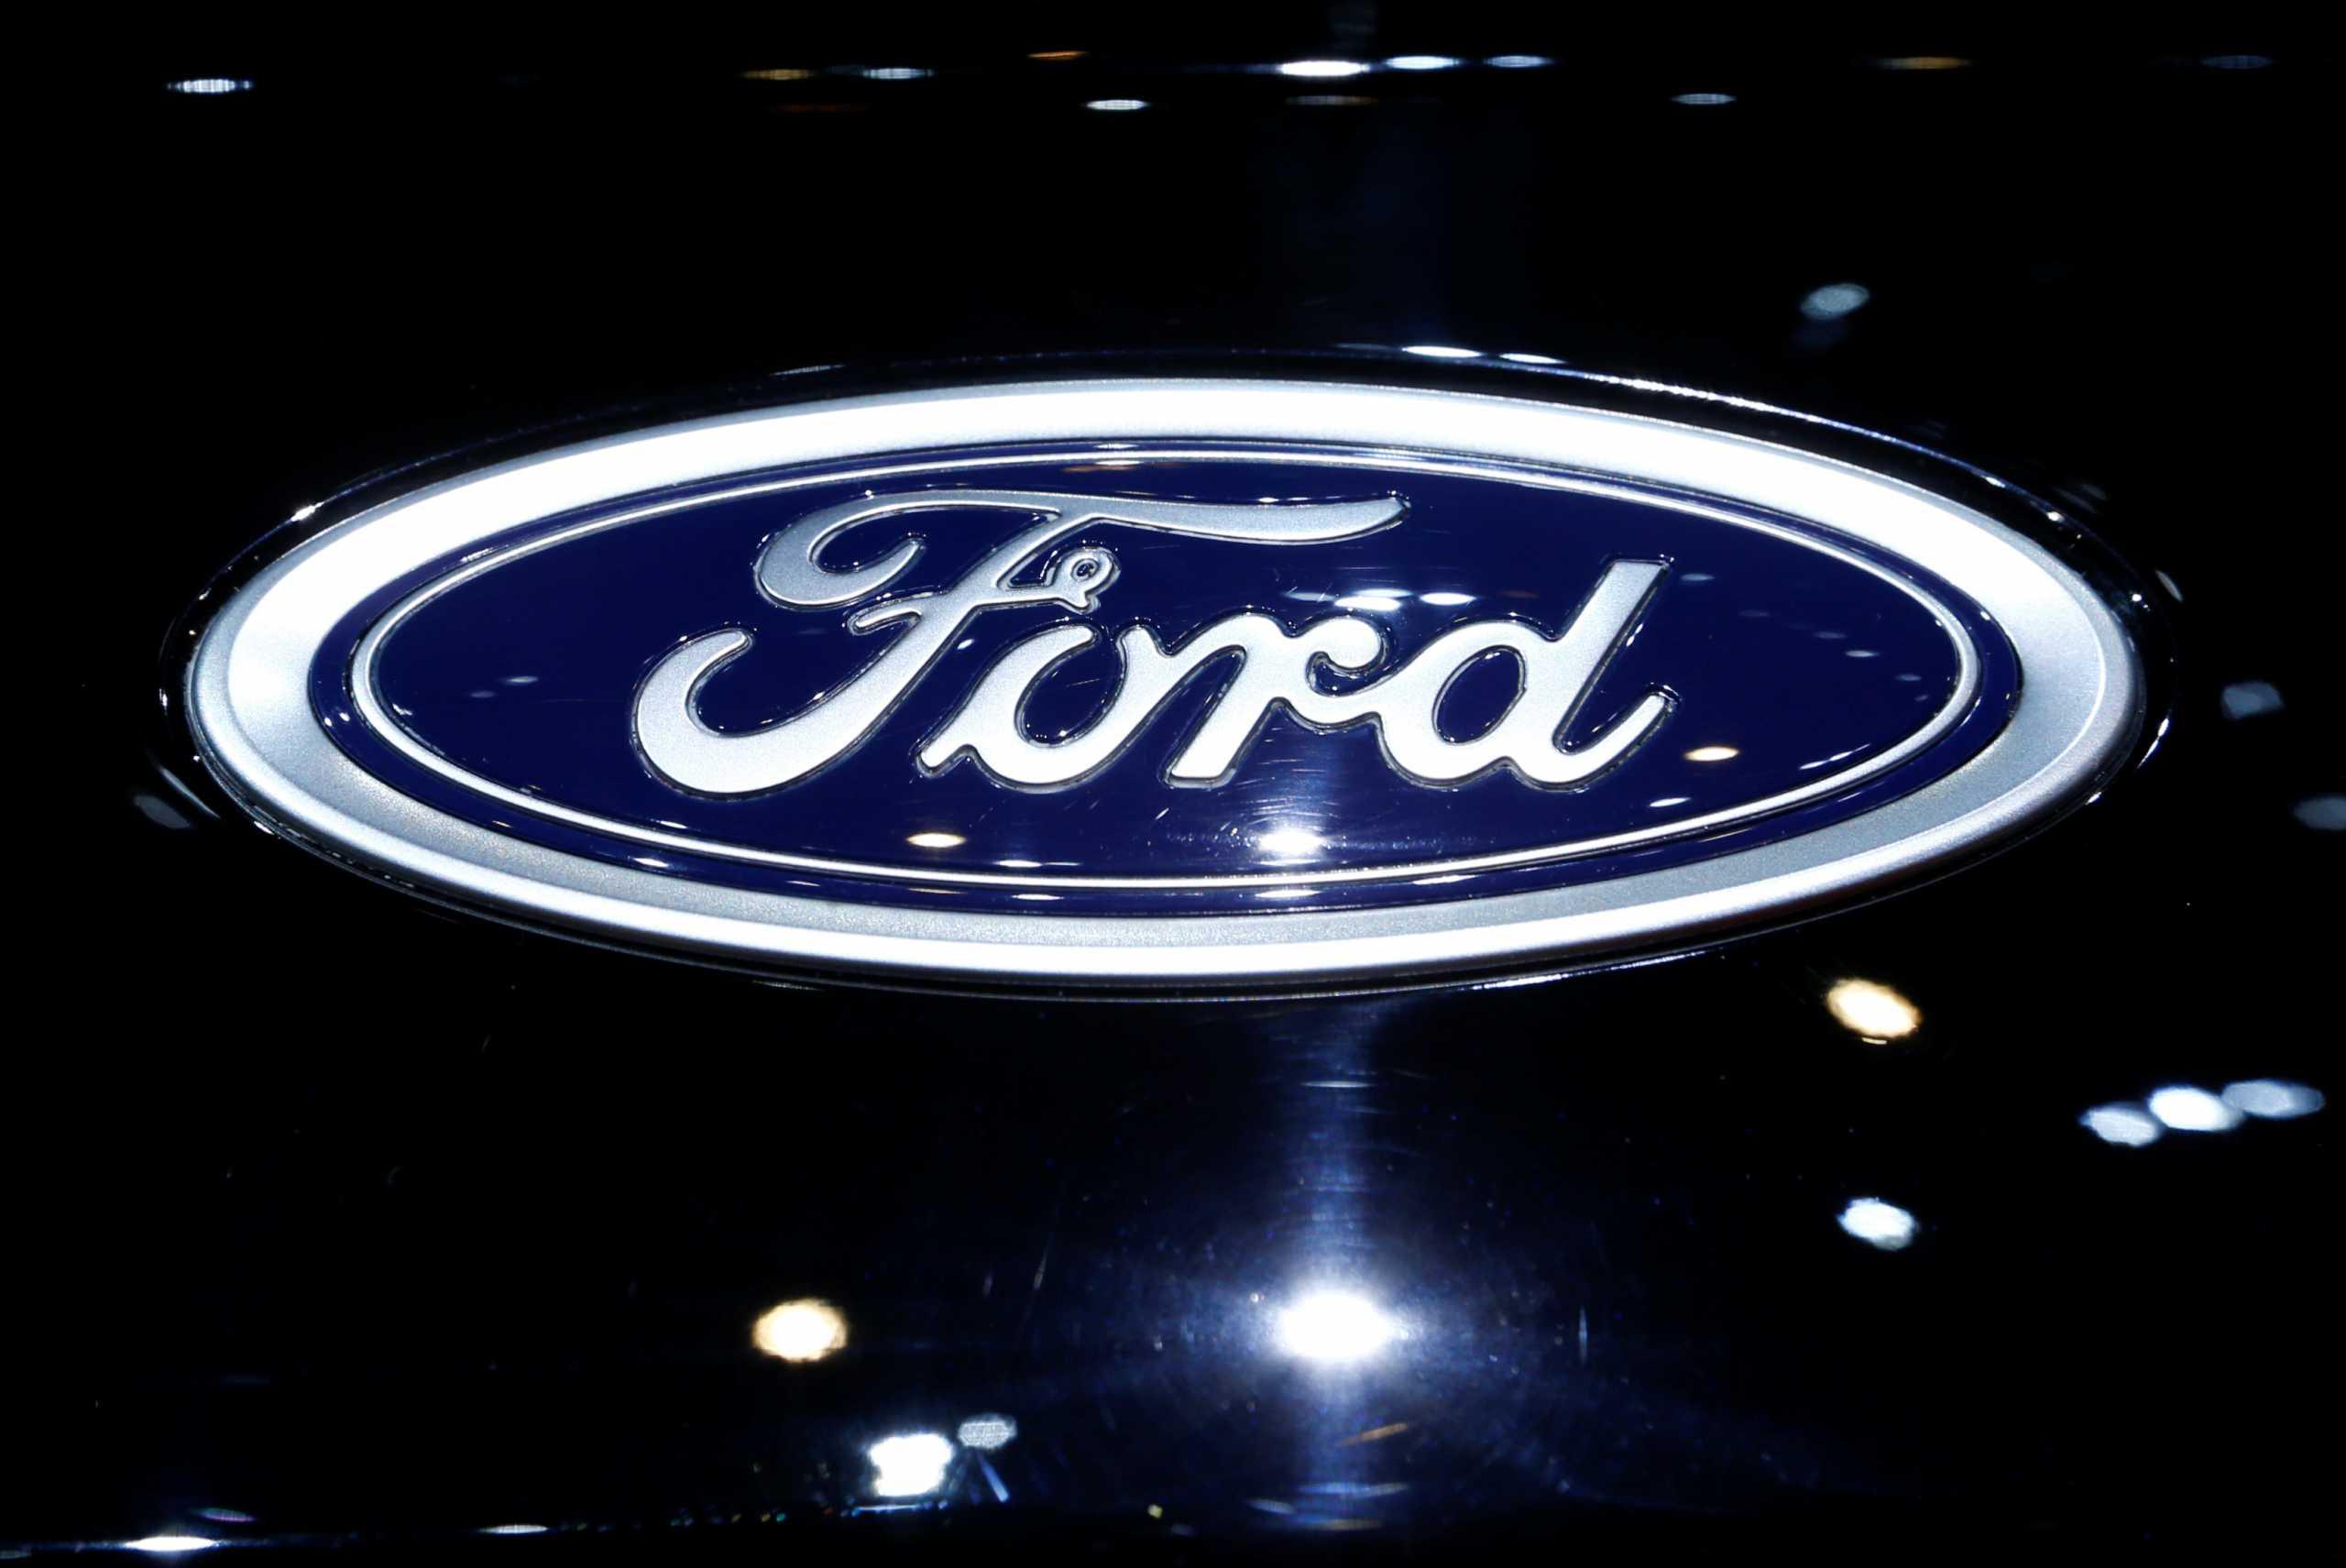 Ford – Ηλεκτρικά αυτοκίνητα: Πάνω από 11.000 νέες θέσεις εργασίας